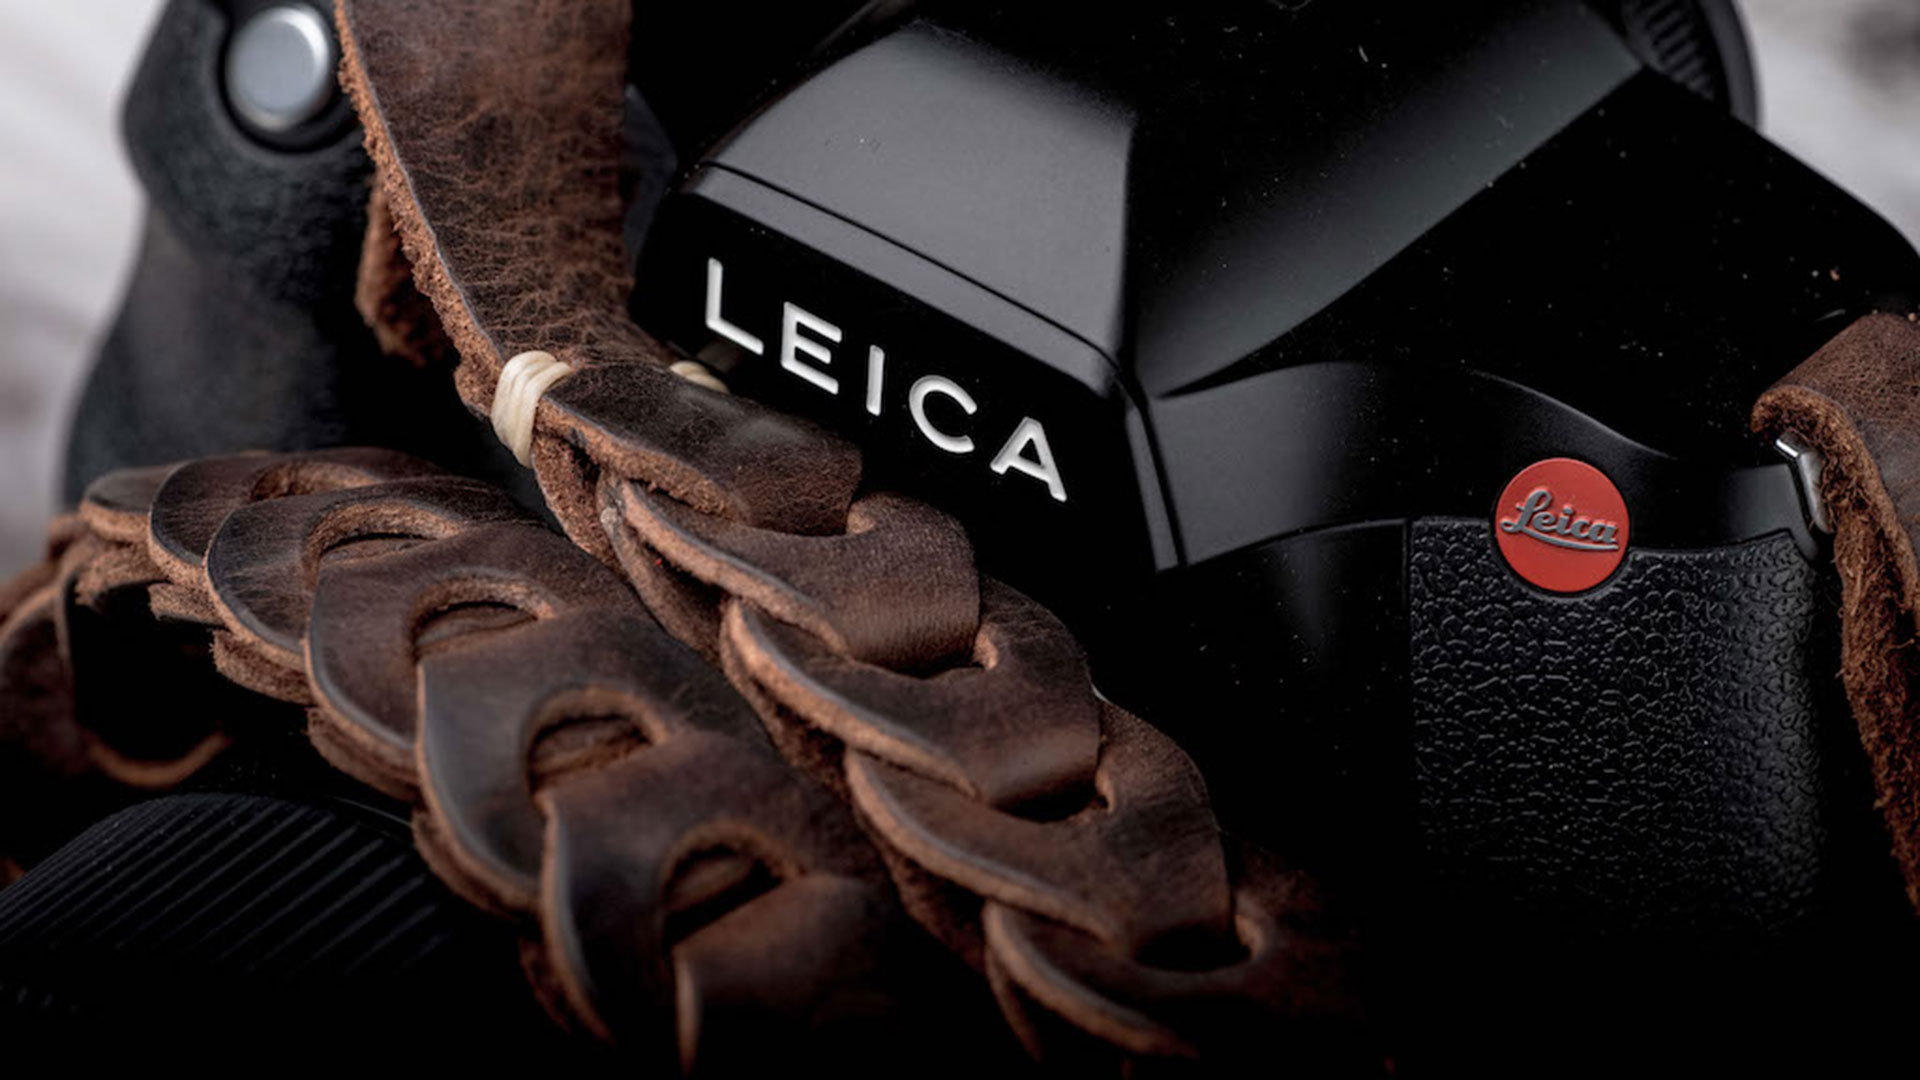 leica s strap, leather camera strap, handmade leather camera strap, vintage camera straps, leica camera strap, handmade camera strap, brown camera strap, mirrorless camera strap